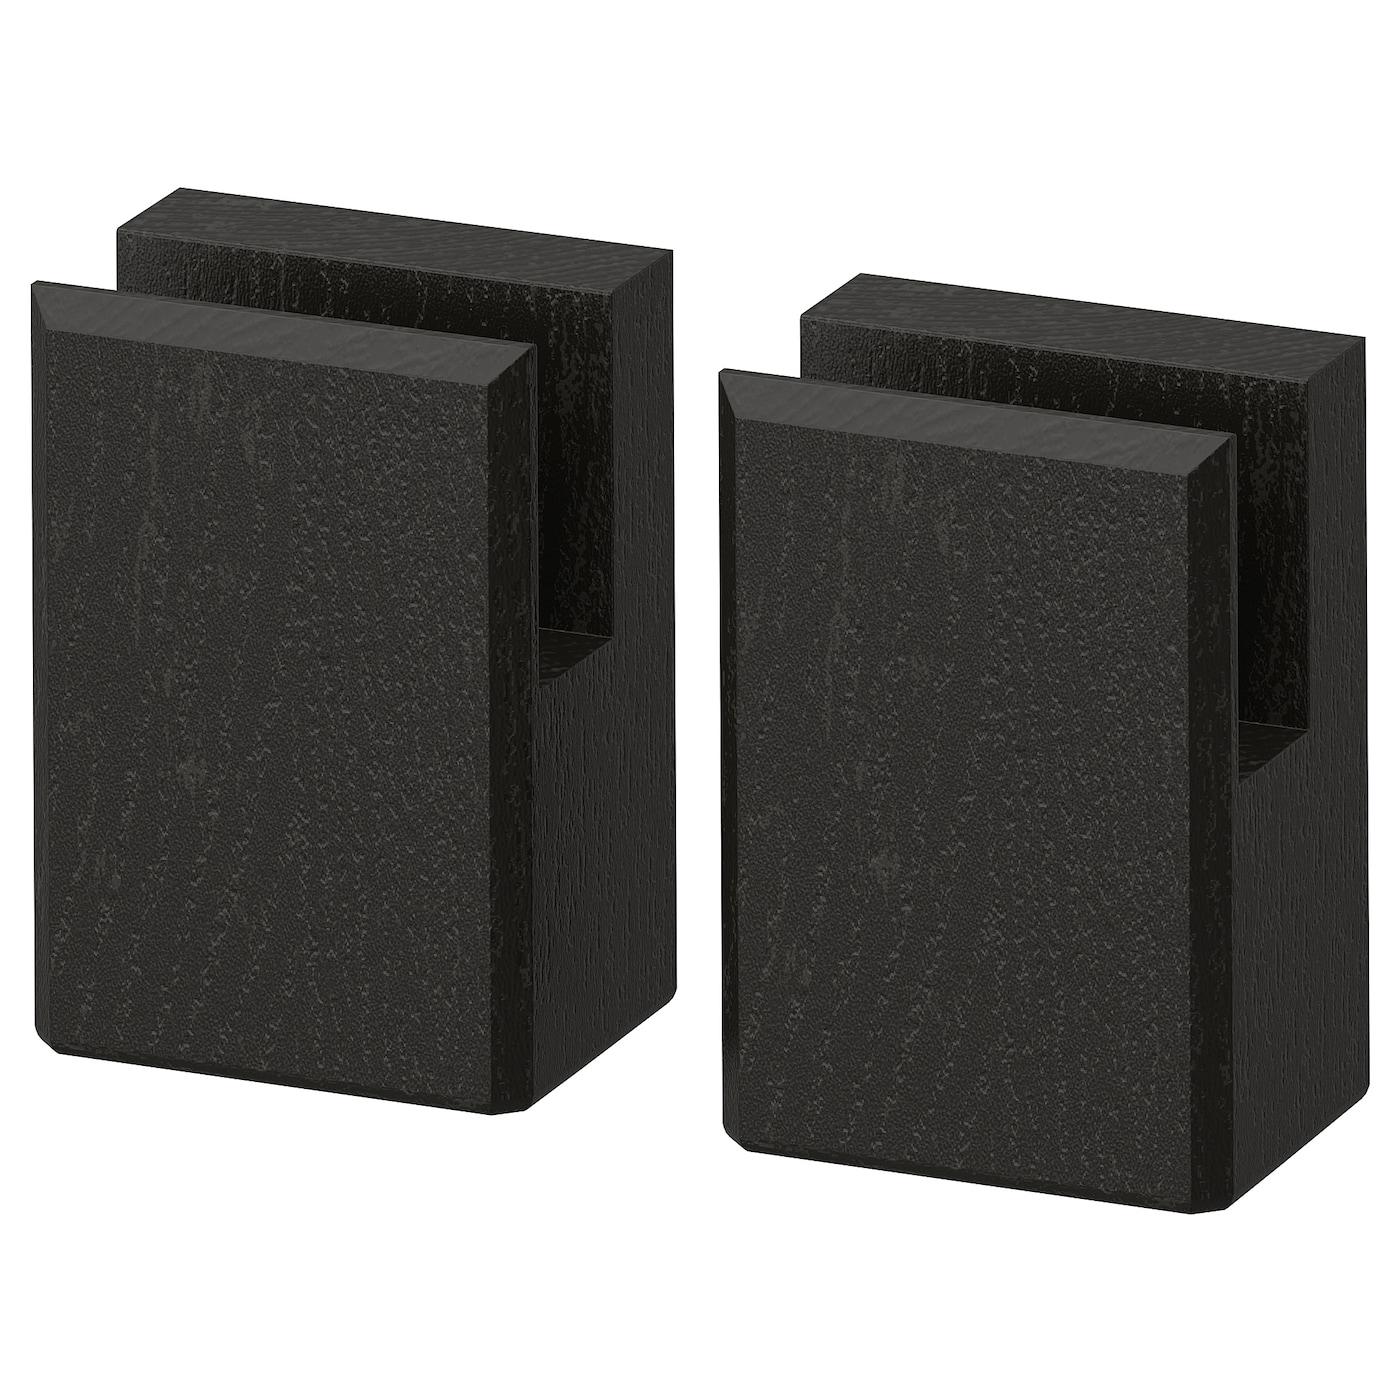 Ikea Kitchen Vs Lowes: Kitchen Plinths & Cabinet Legs